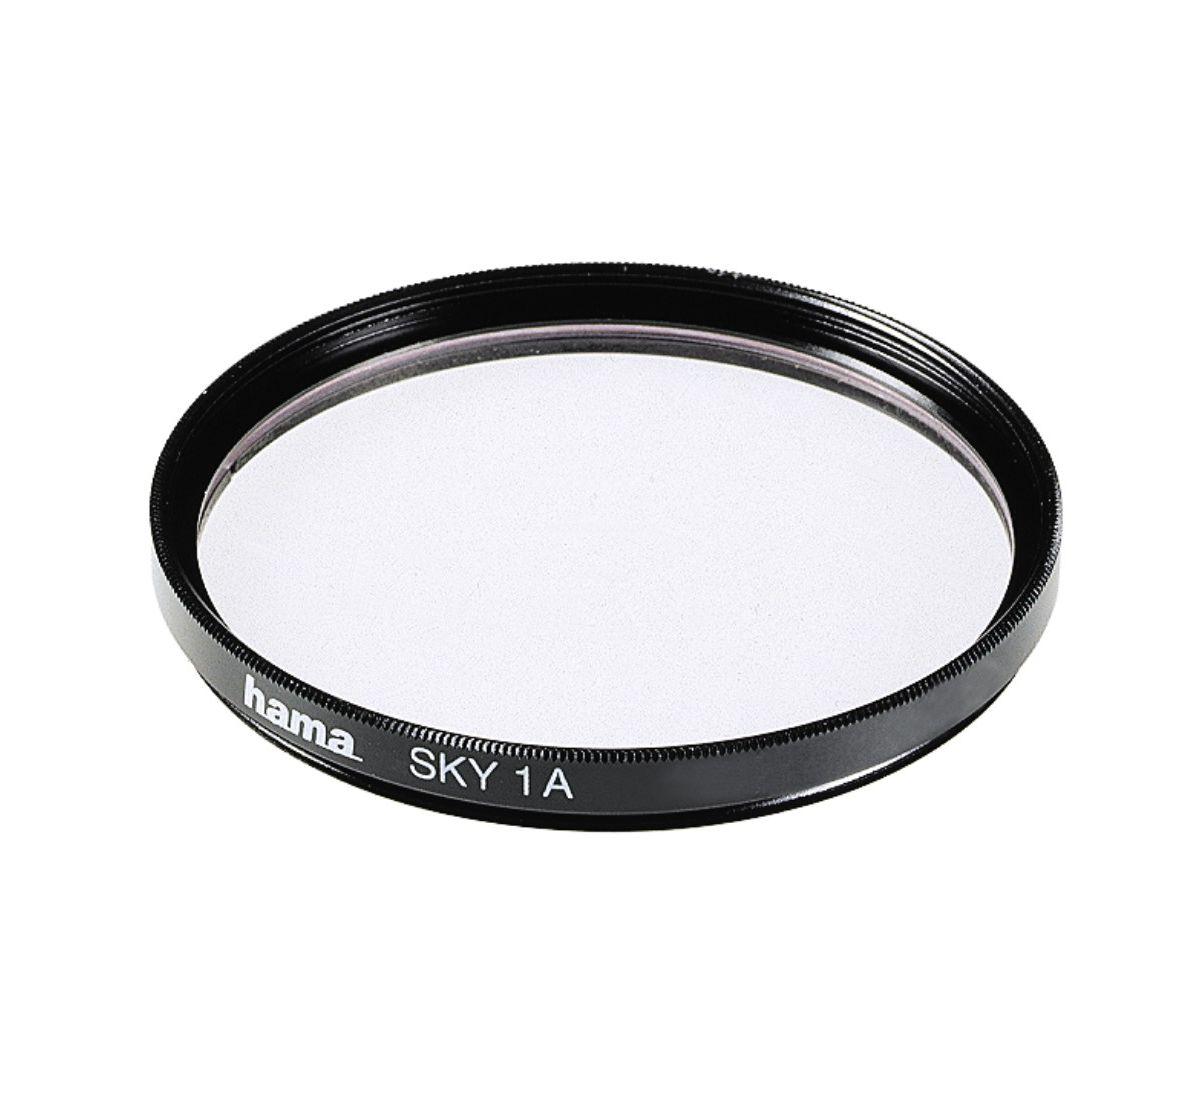 Hama Skylight-Filter 1 A (LA+10), AR coated, 52...